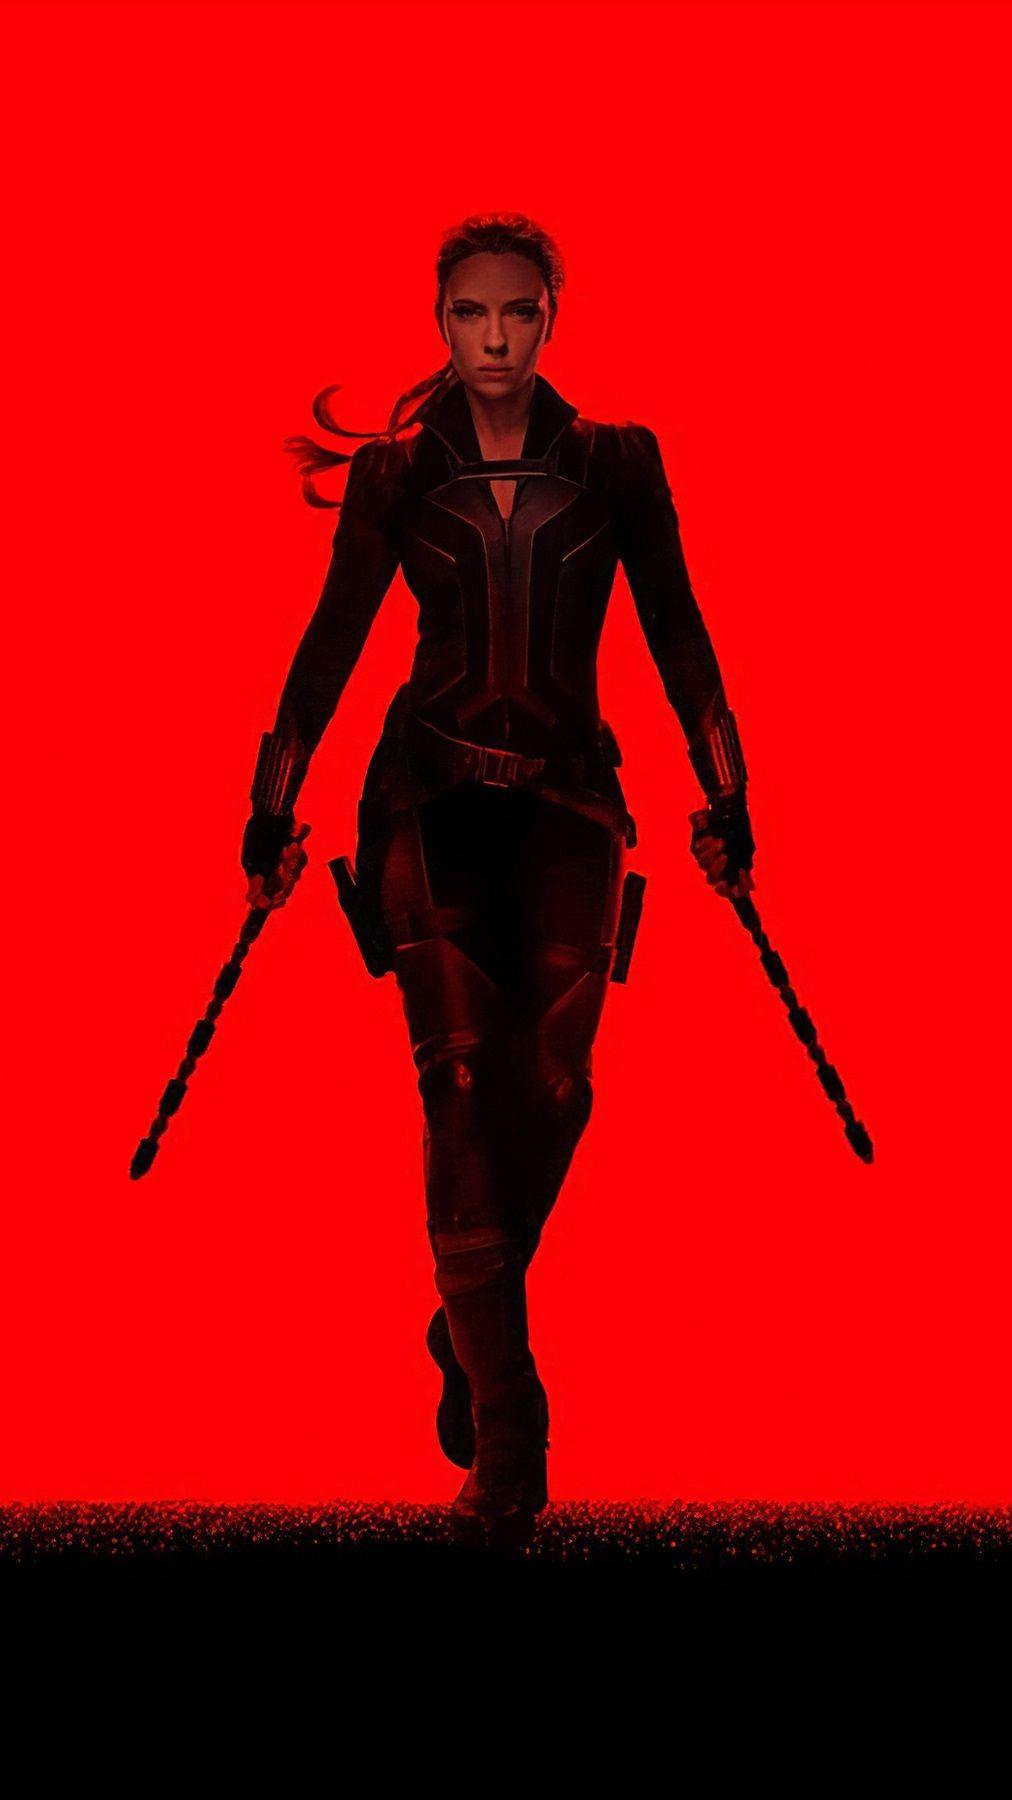 Black Widow 2020 Iphone Wallpaper Black Widow Marvel Black Widow Wallpaper Black Widow Avengers